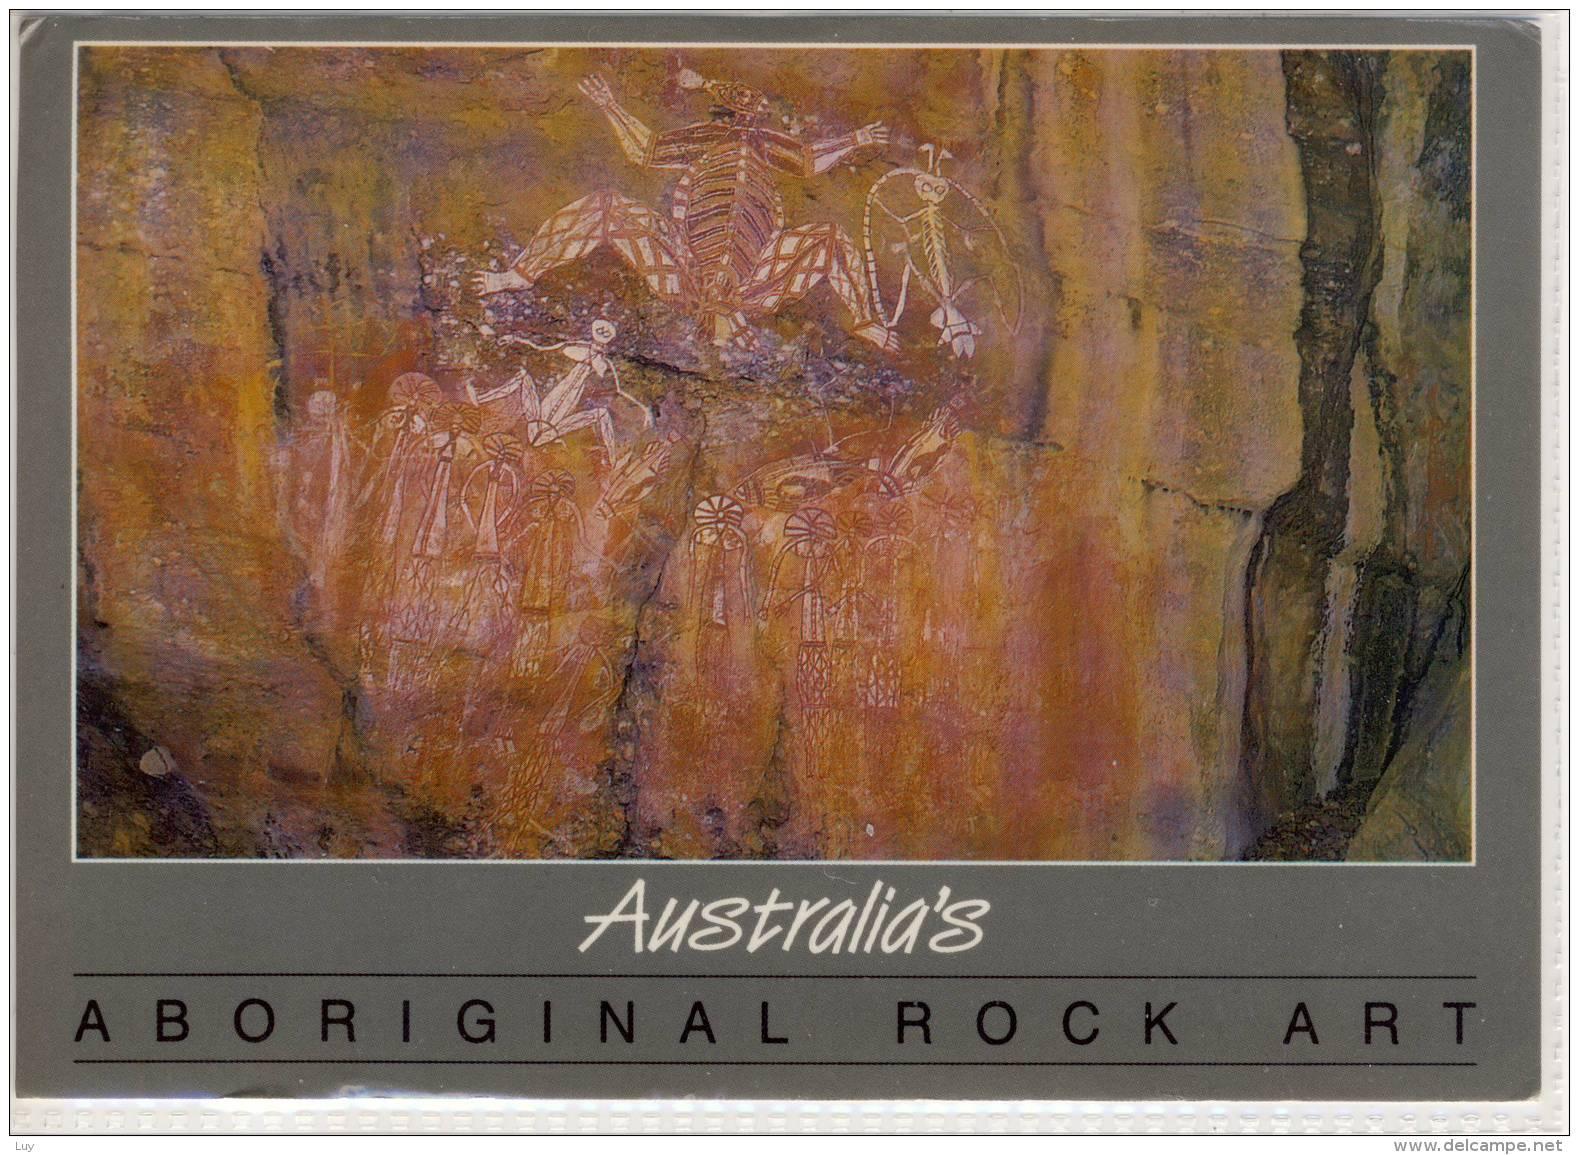 AUSTRALIAN's ABORIGINAL ROCK ART ; Large Format, Nice Stamp - Aborigines